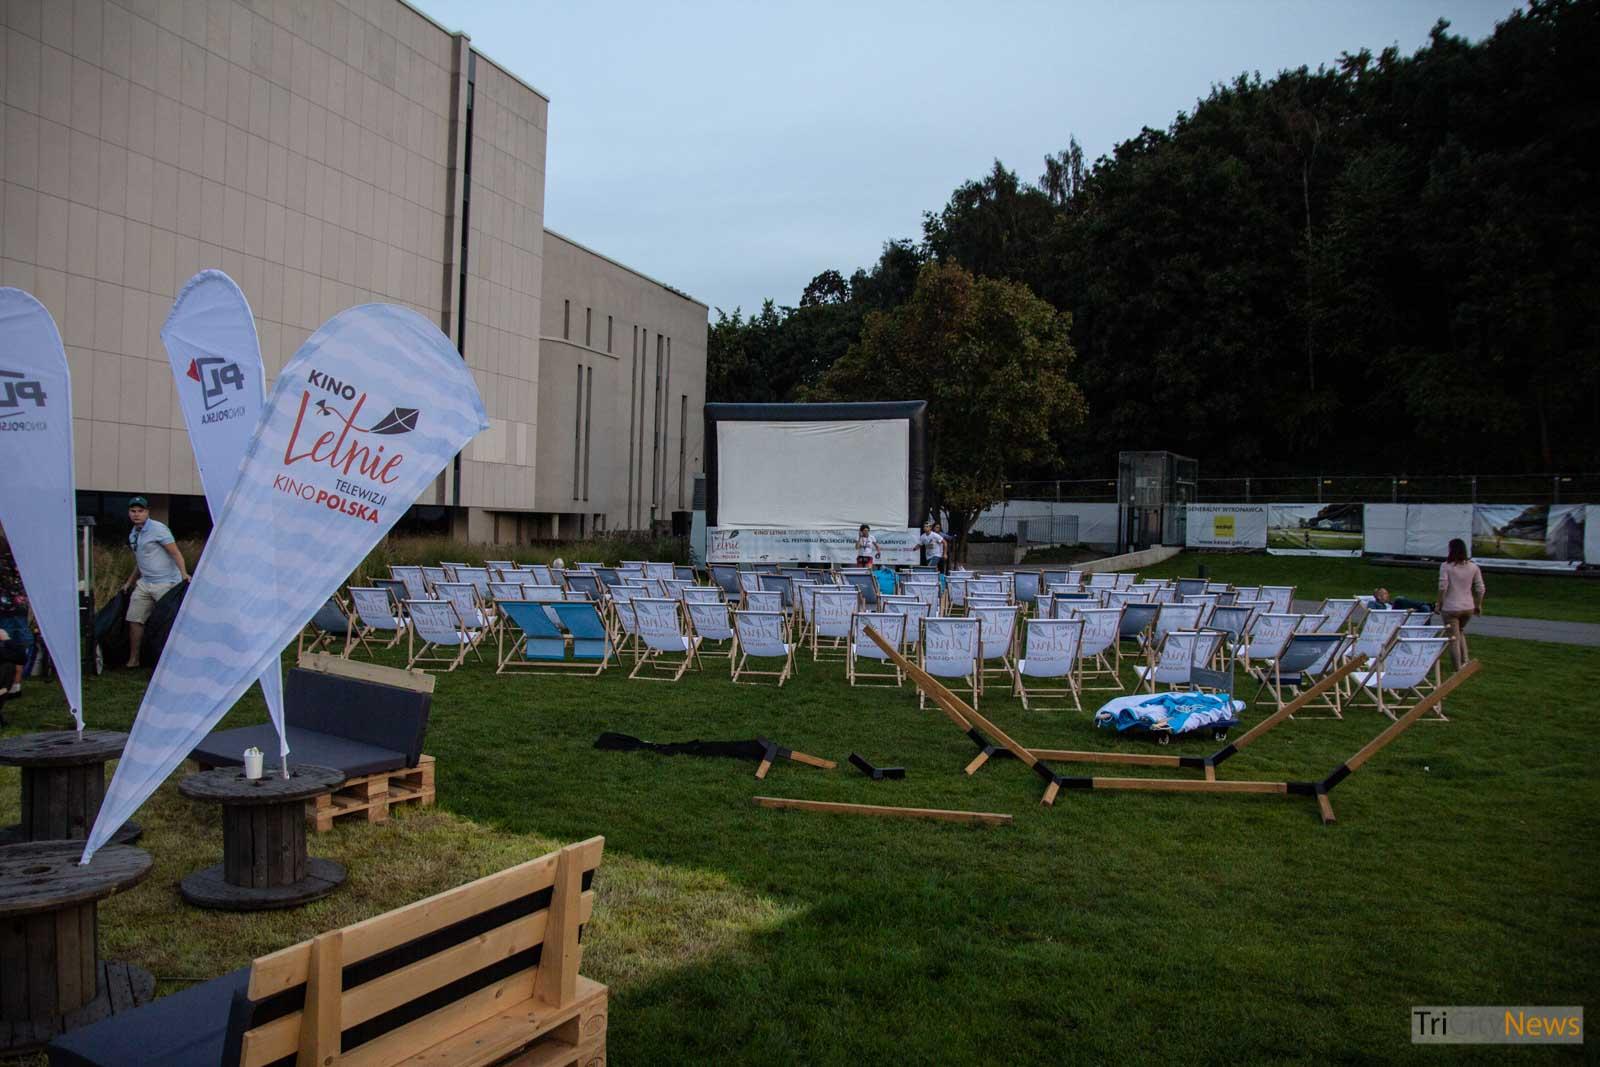 Outdoor cinema at Polish Film Festival in Gdynia, photo: Jakub Woźniak/Tricity New